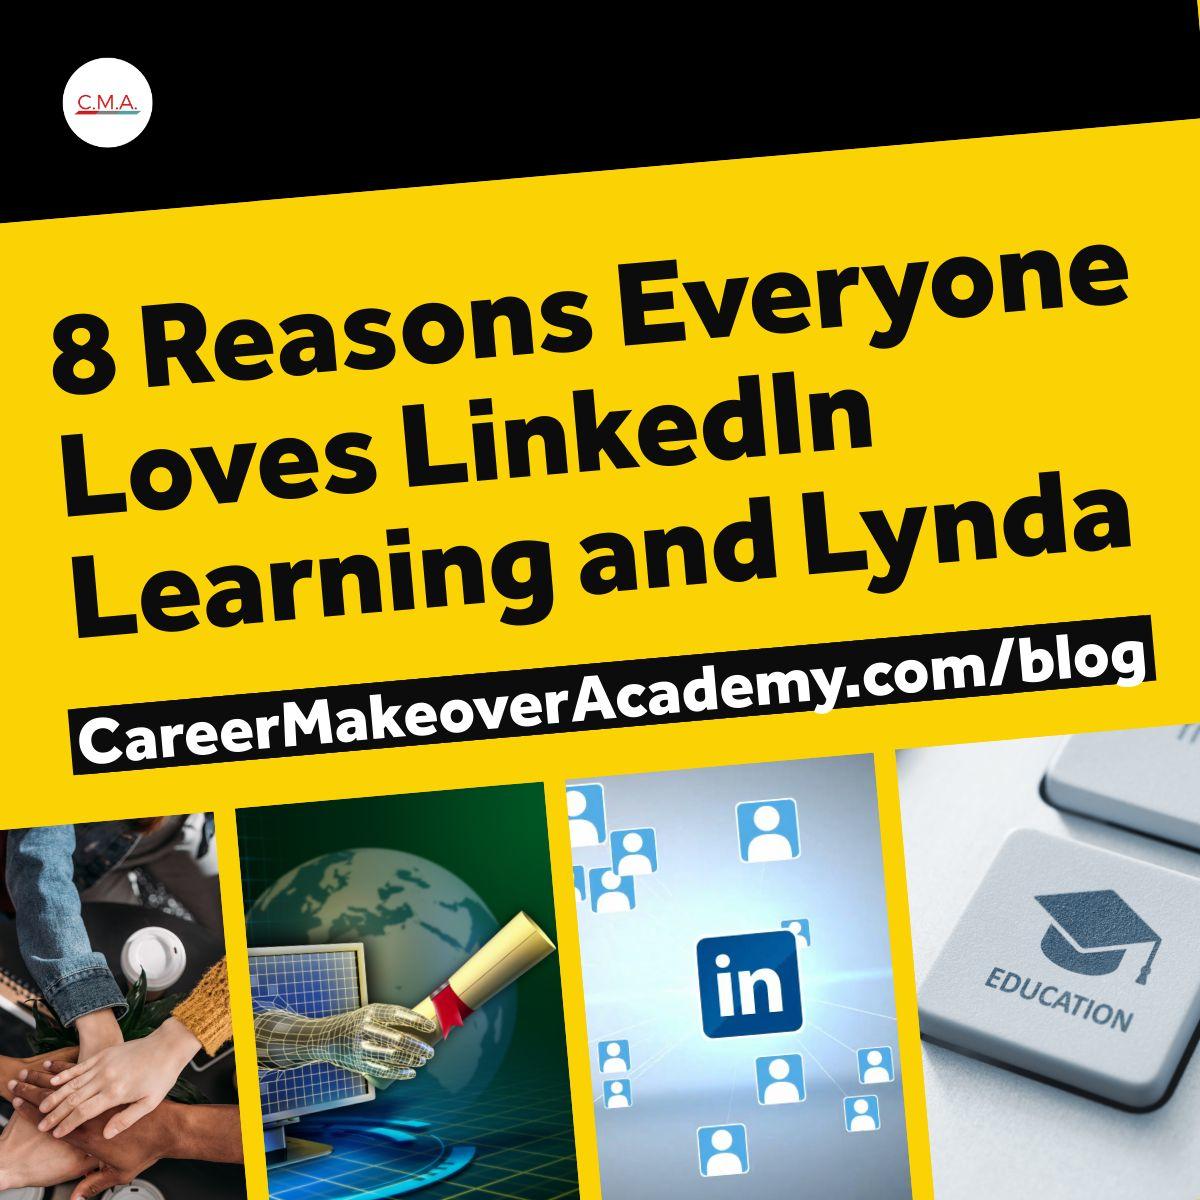 LinkedIn Learning and Linda - Career Makeover Academy